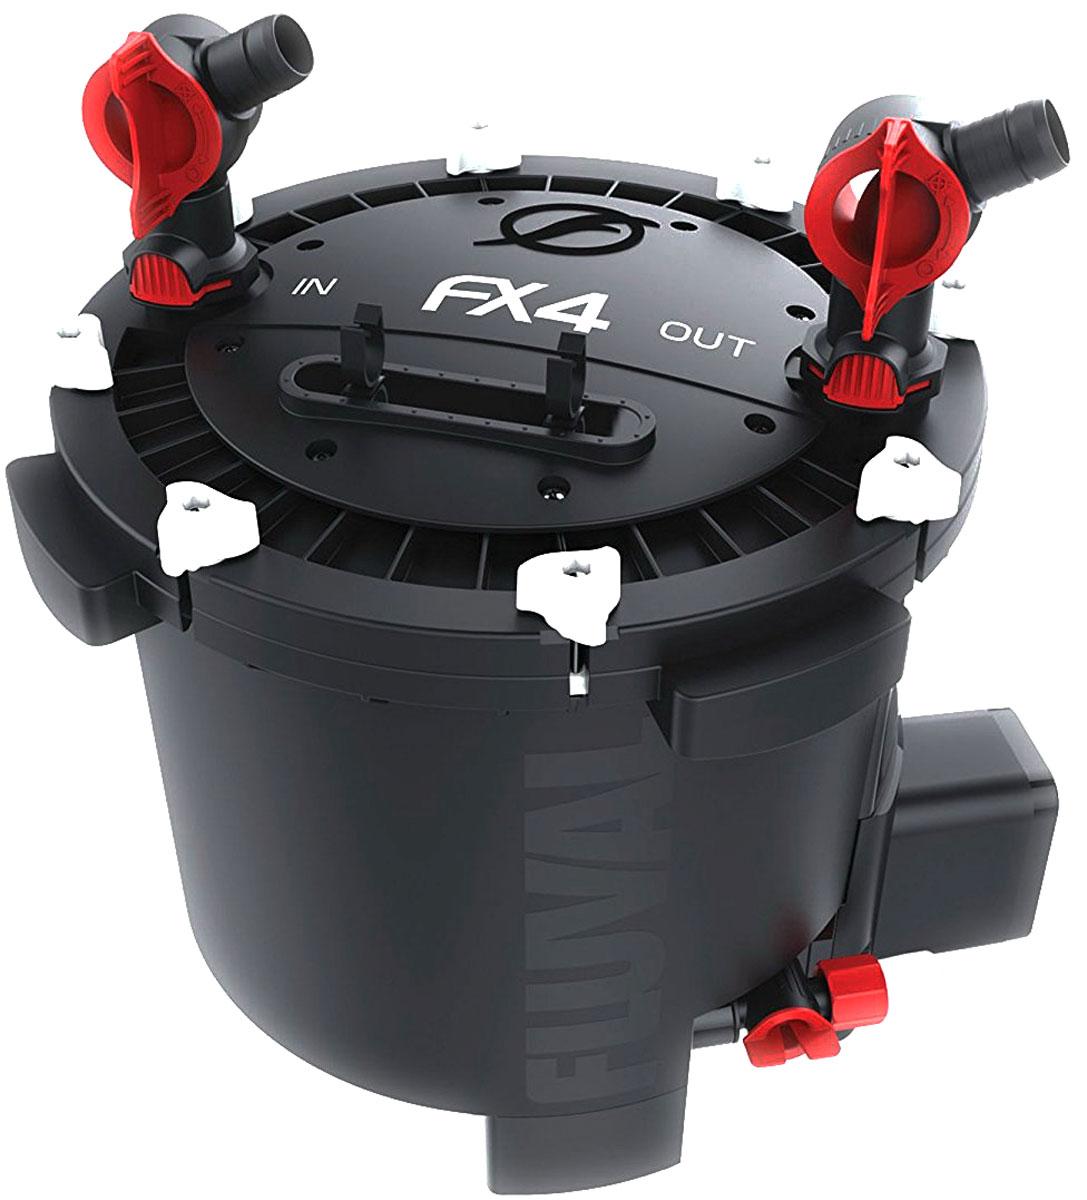 Фильтр для аквариума Fluval Fluval FX4, канистровый led fluval светильники для аквариума 70 литров